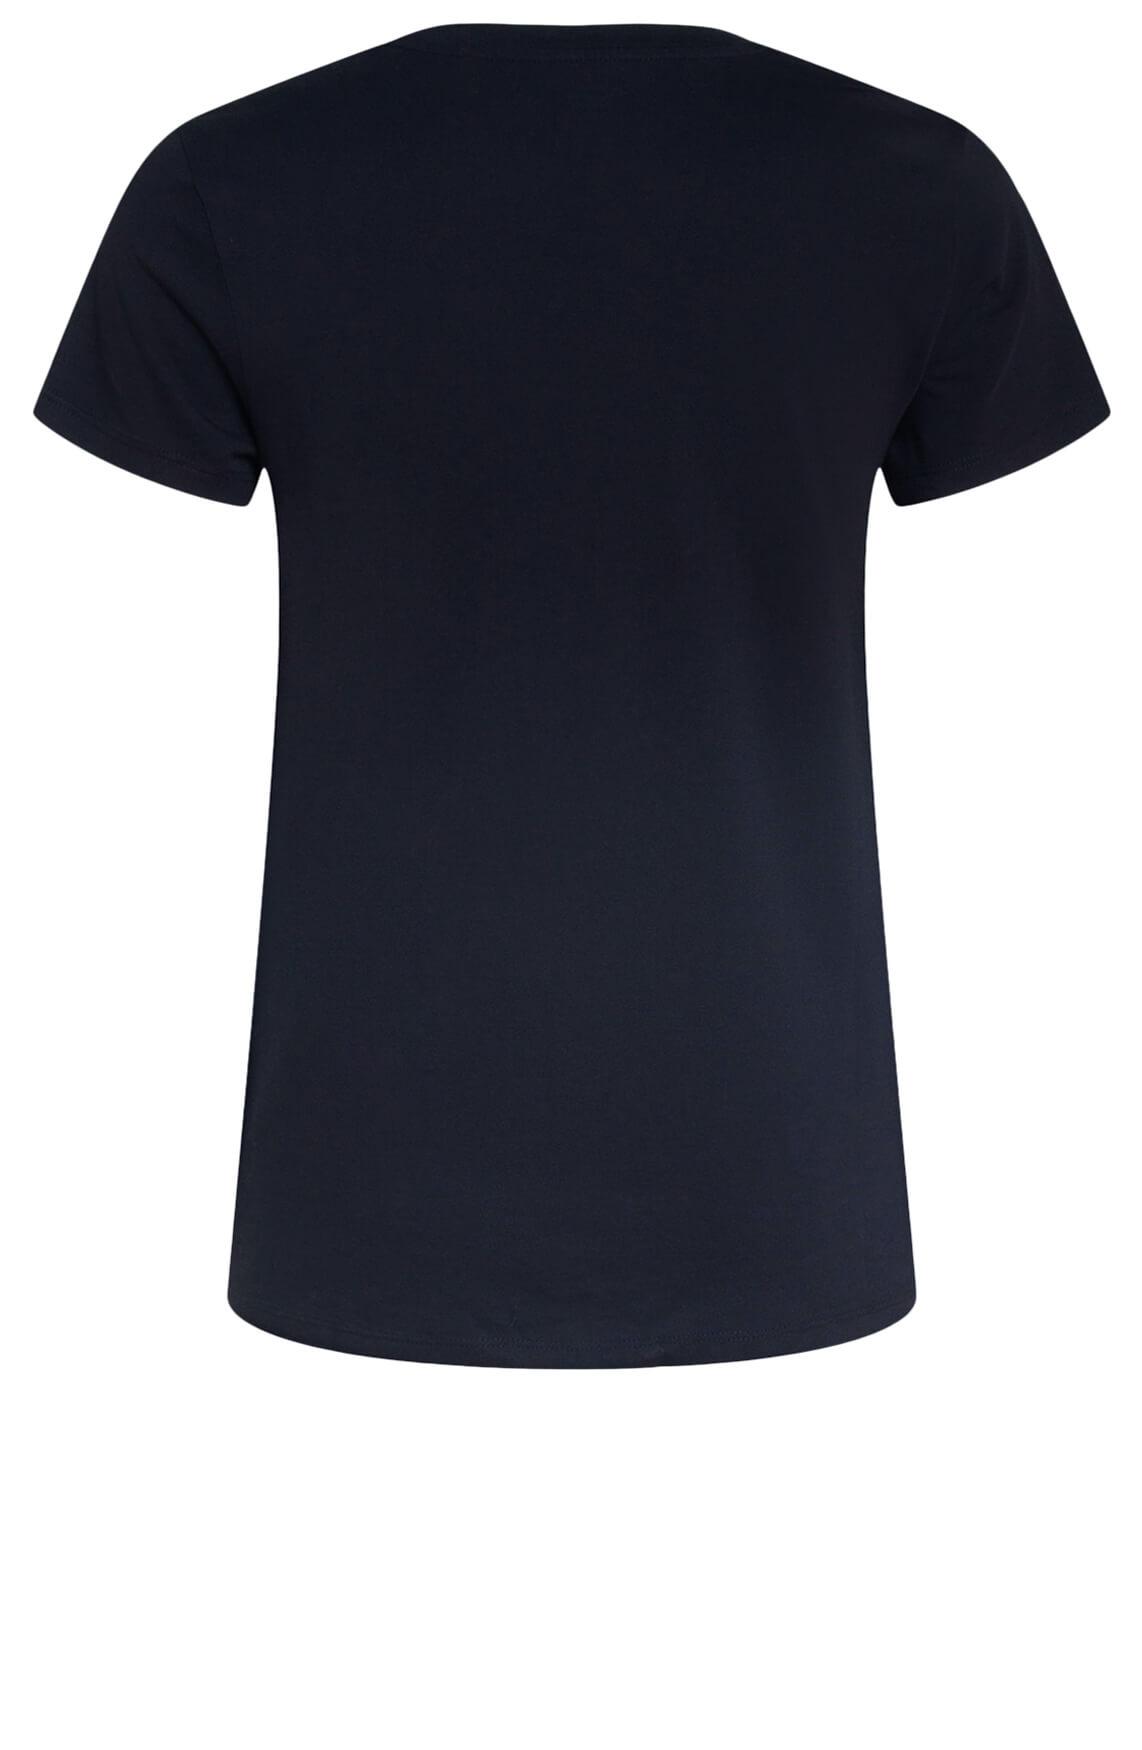 Levi s Dames Shirt met opdruk zwart